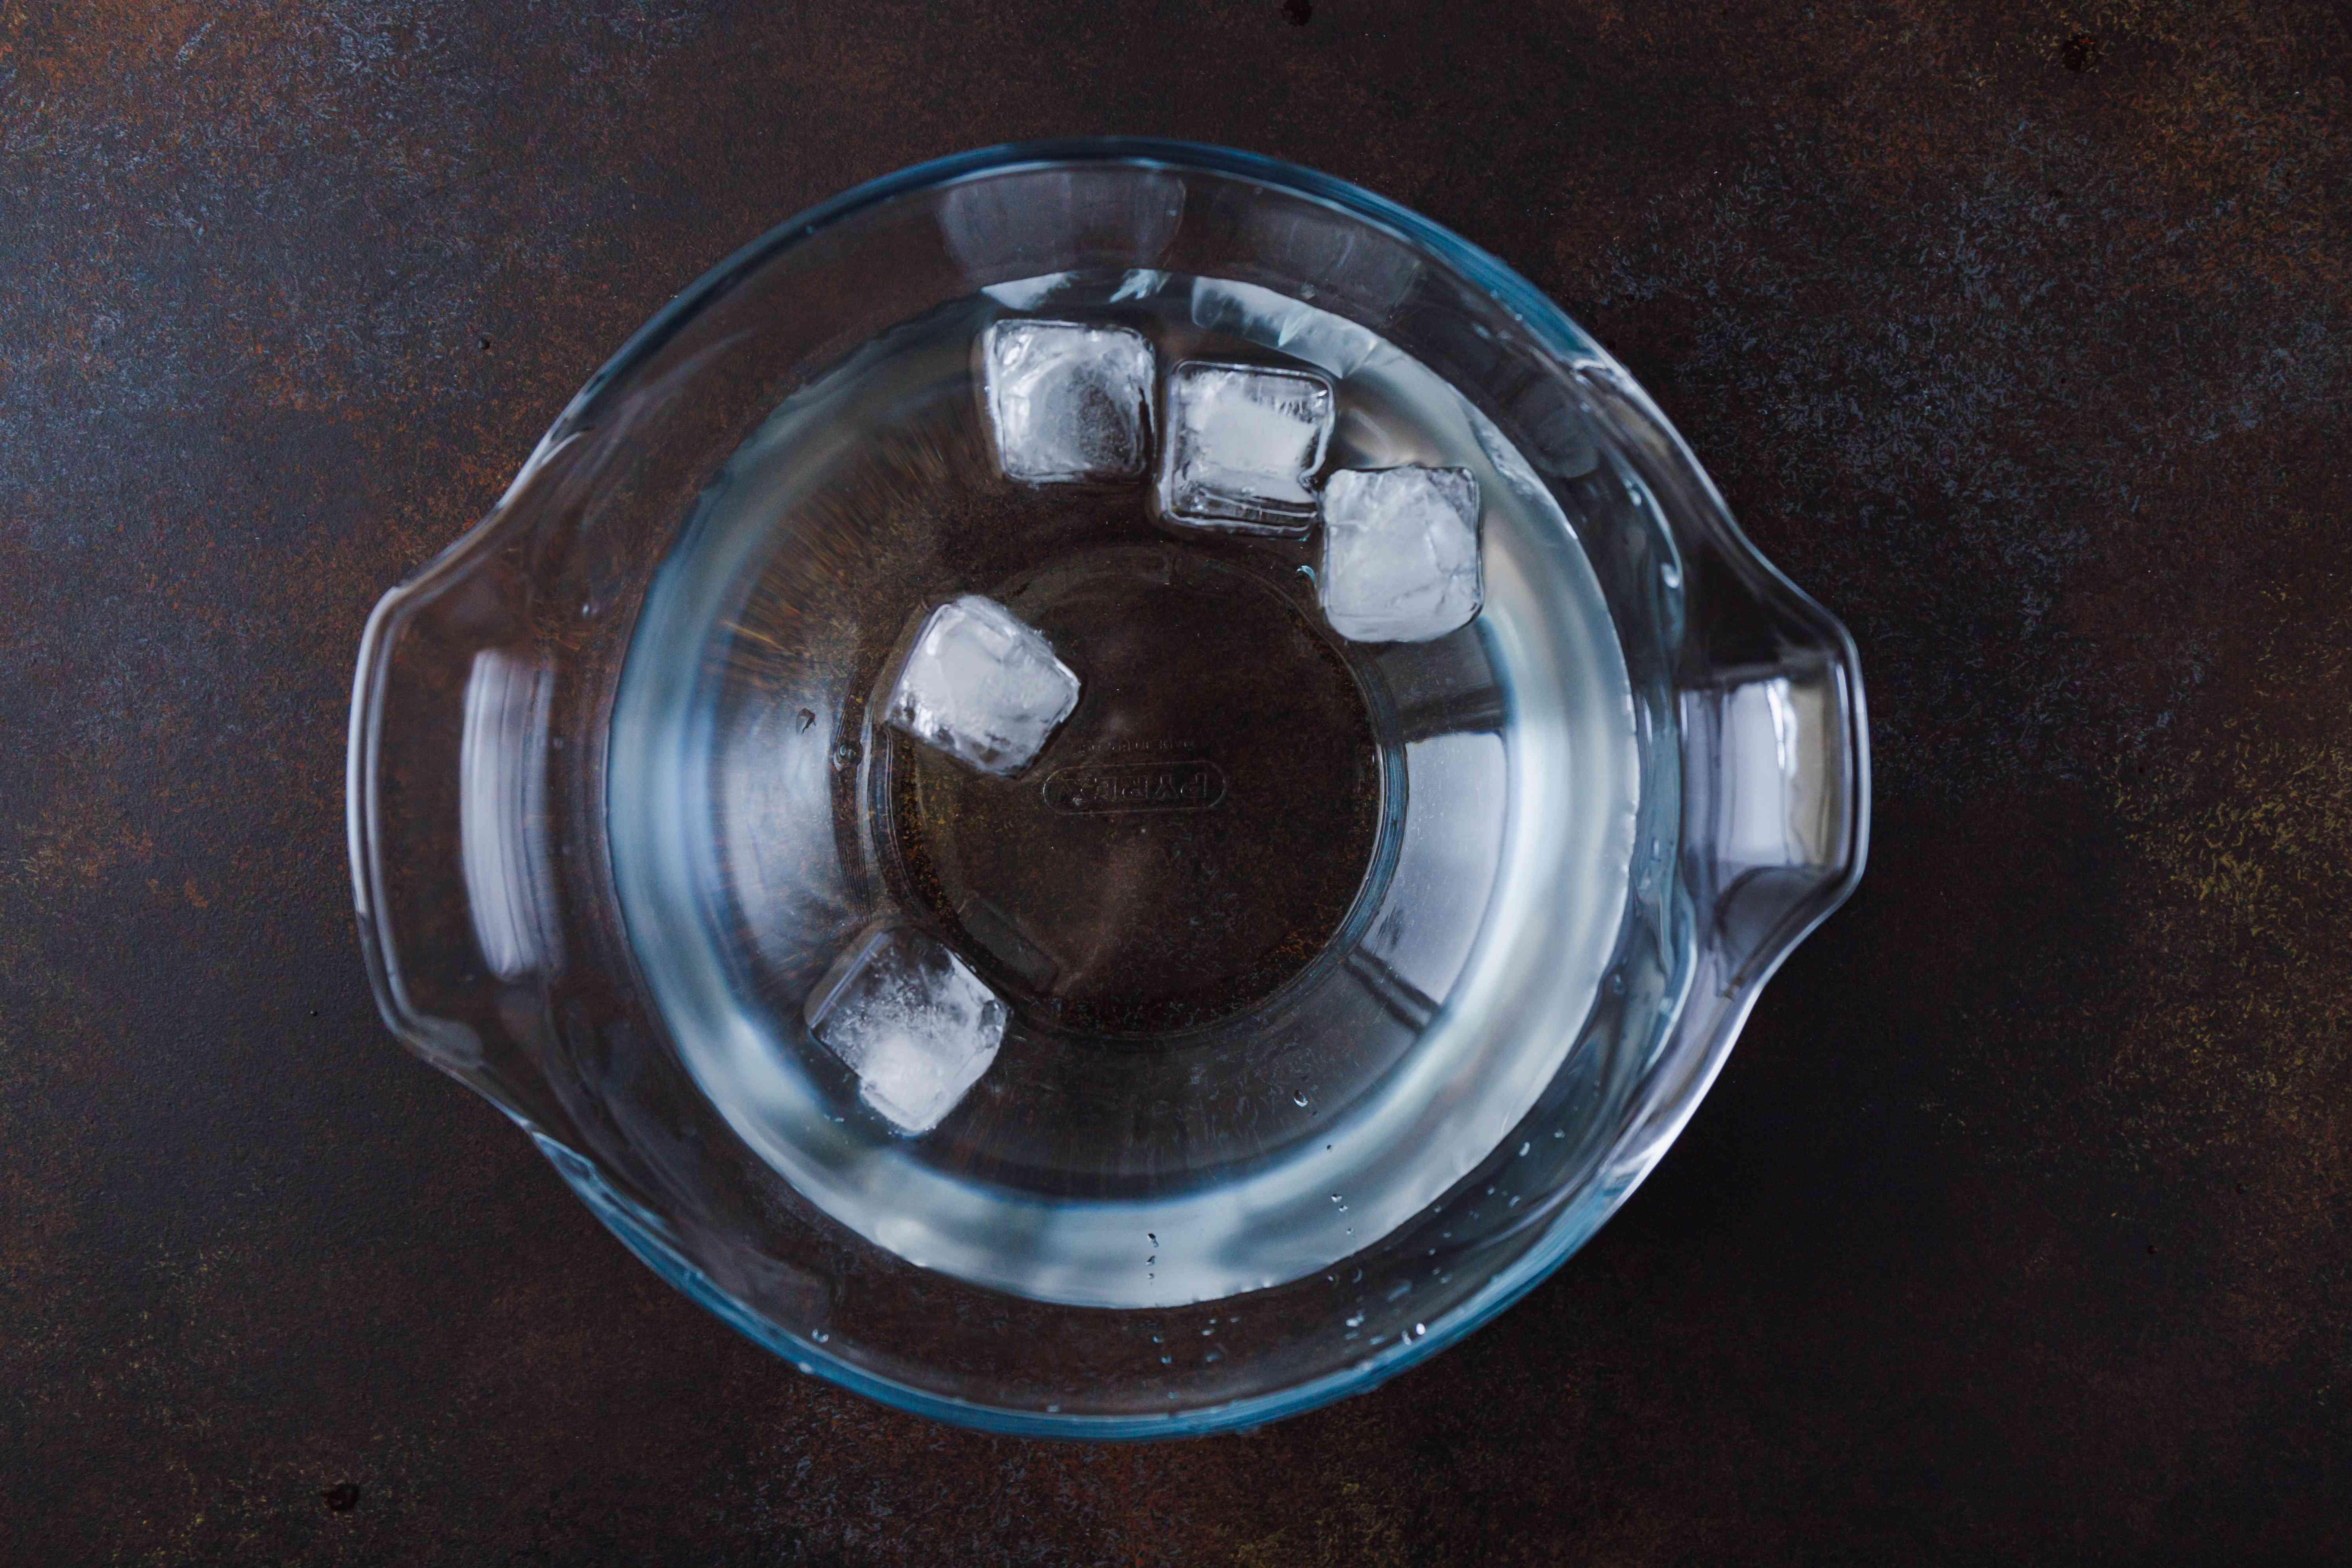 Prepare bowl of ice water